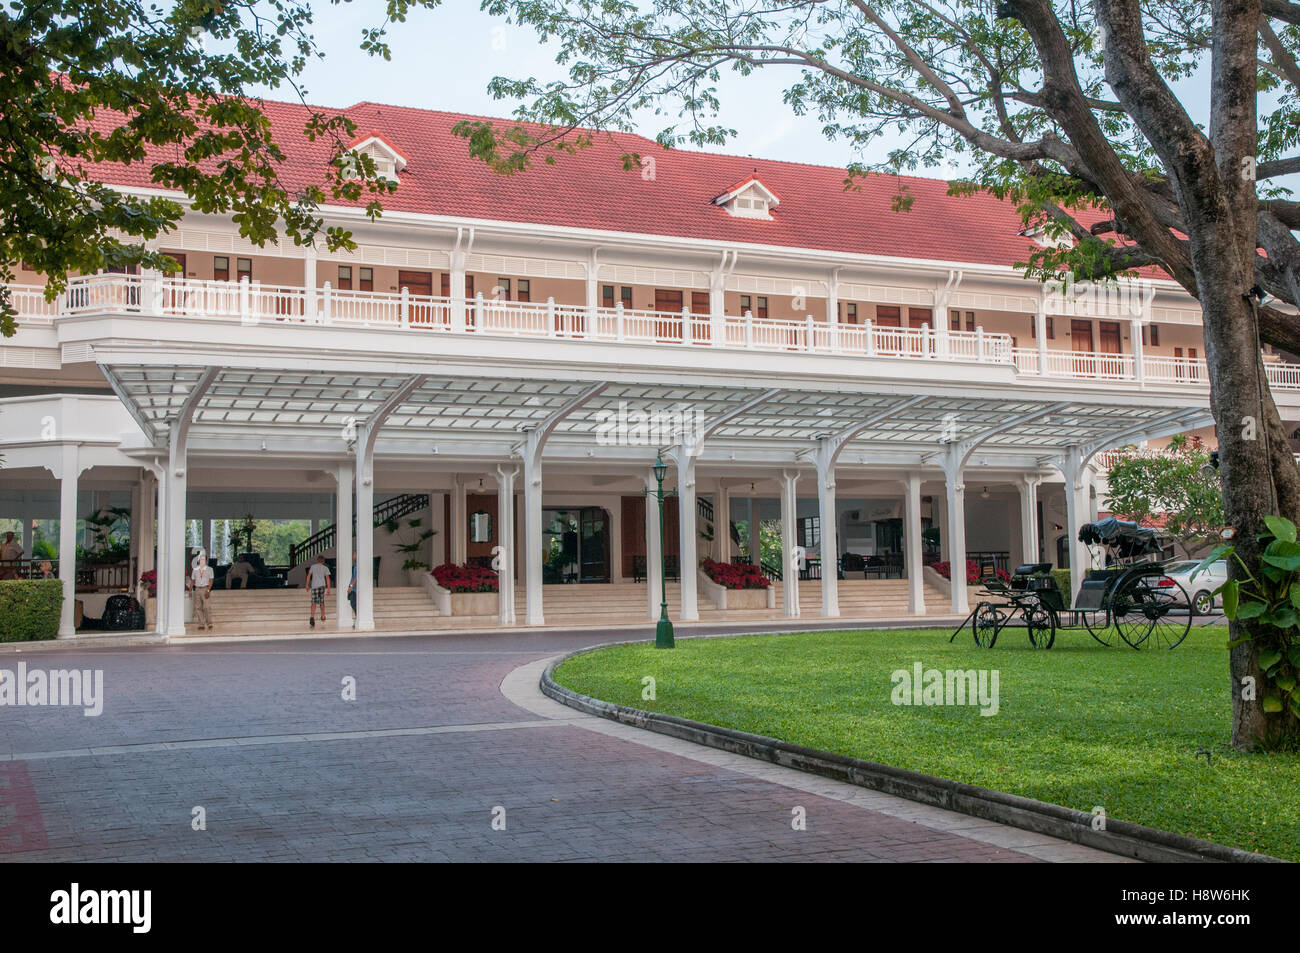 The historic Railway Hotel in Hua Hin Thailand currently known as Centara Grand Beach resort & villas - Stock Image